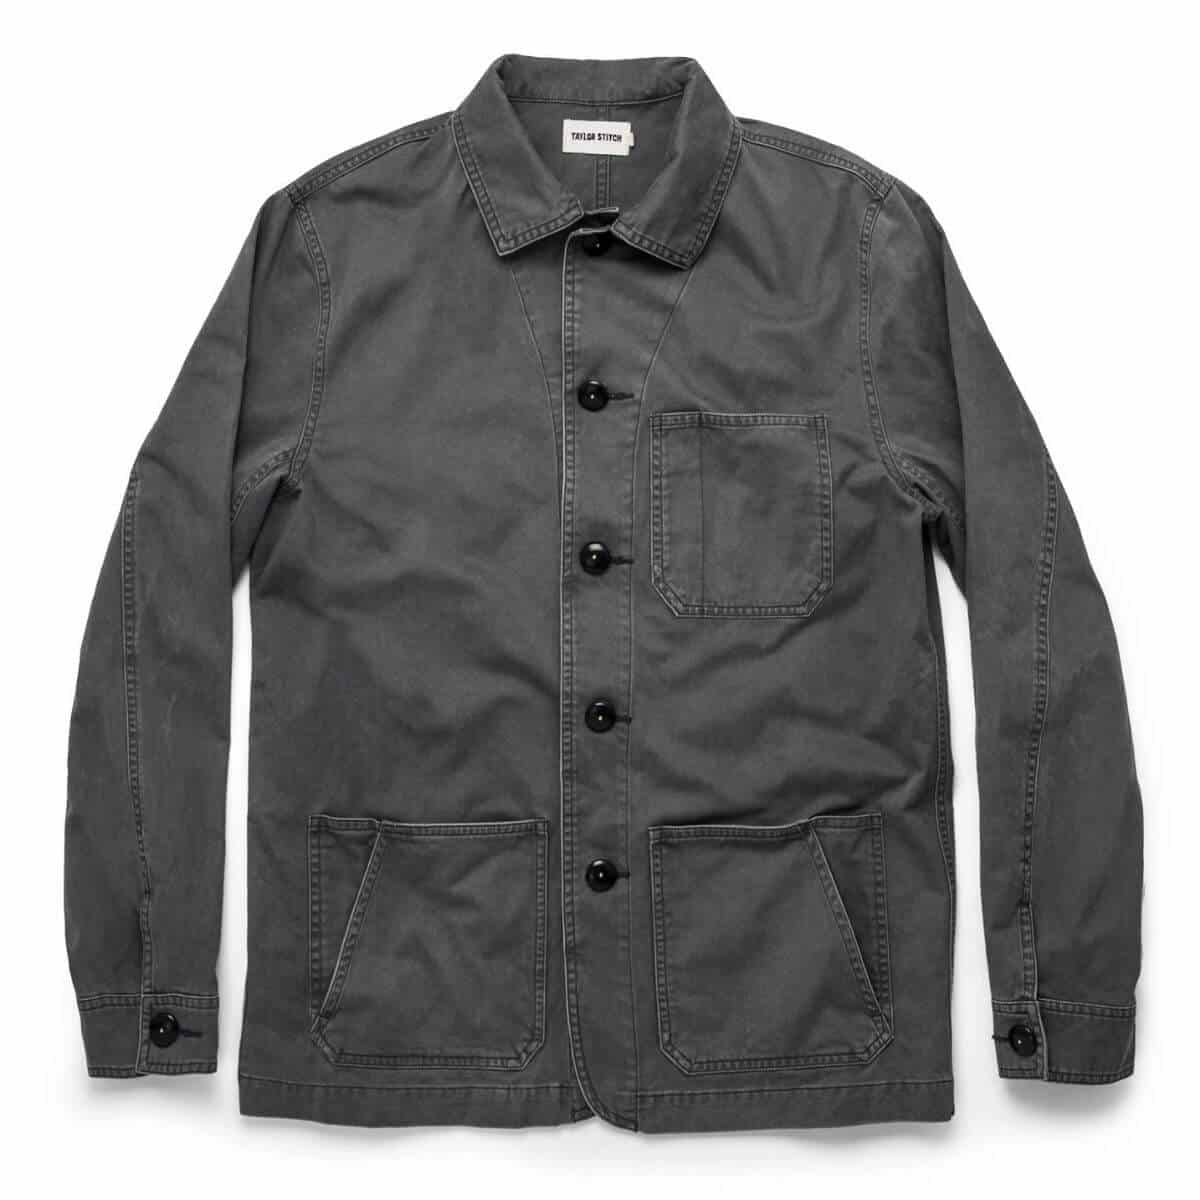 Taylor Stitch grey chore jacket.